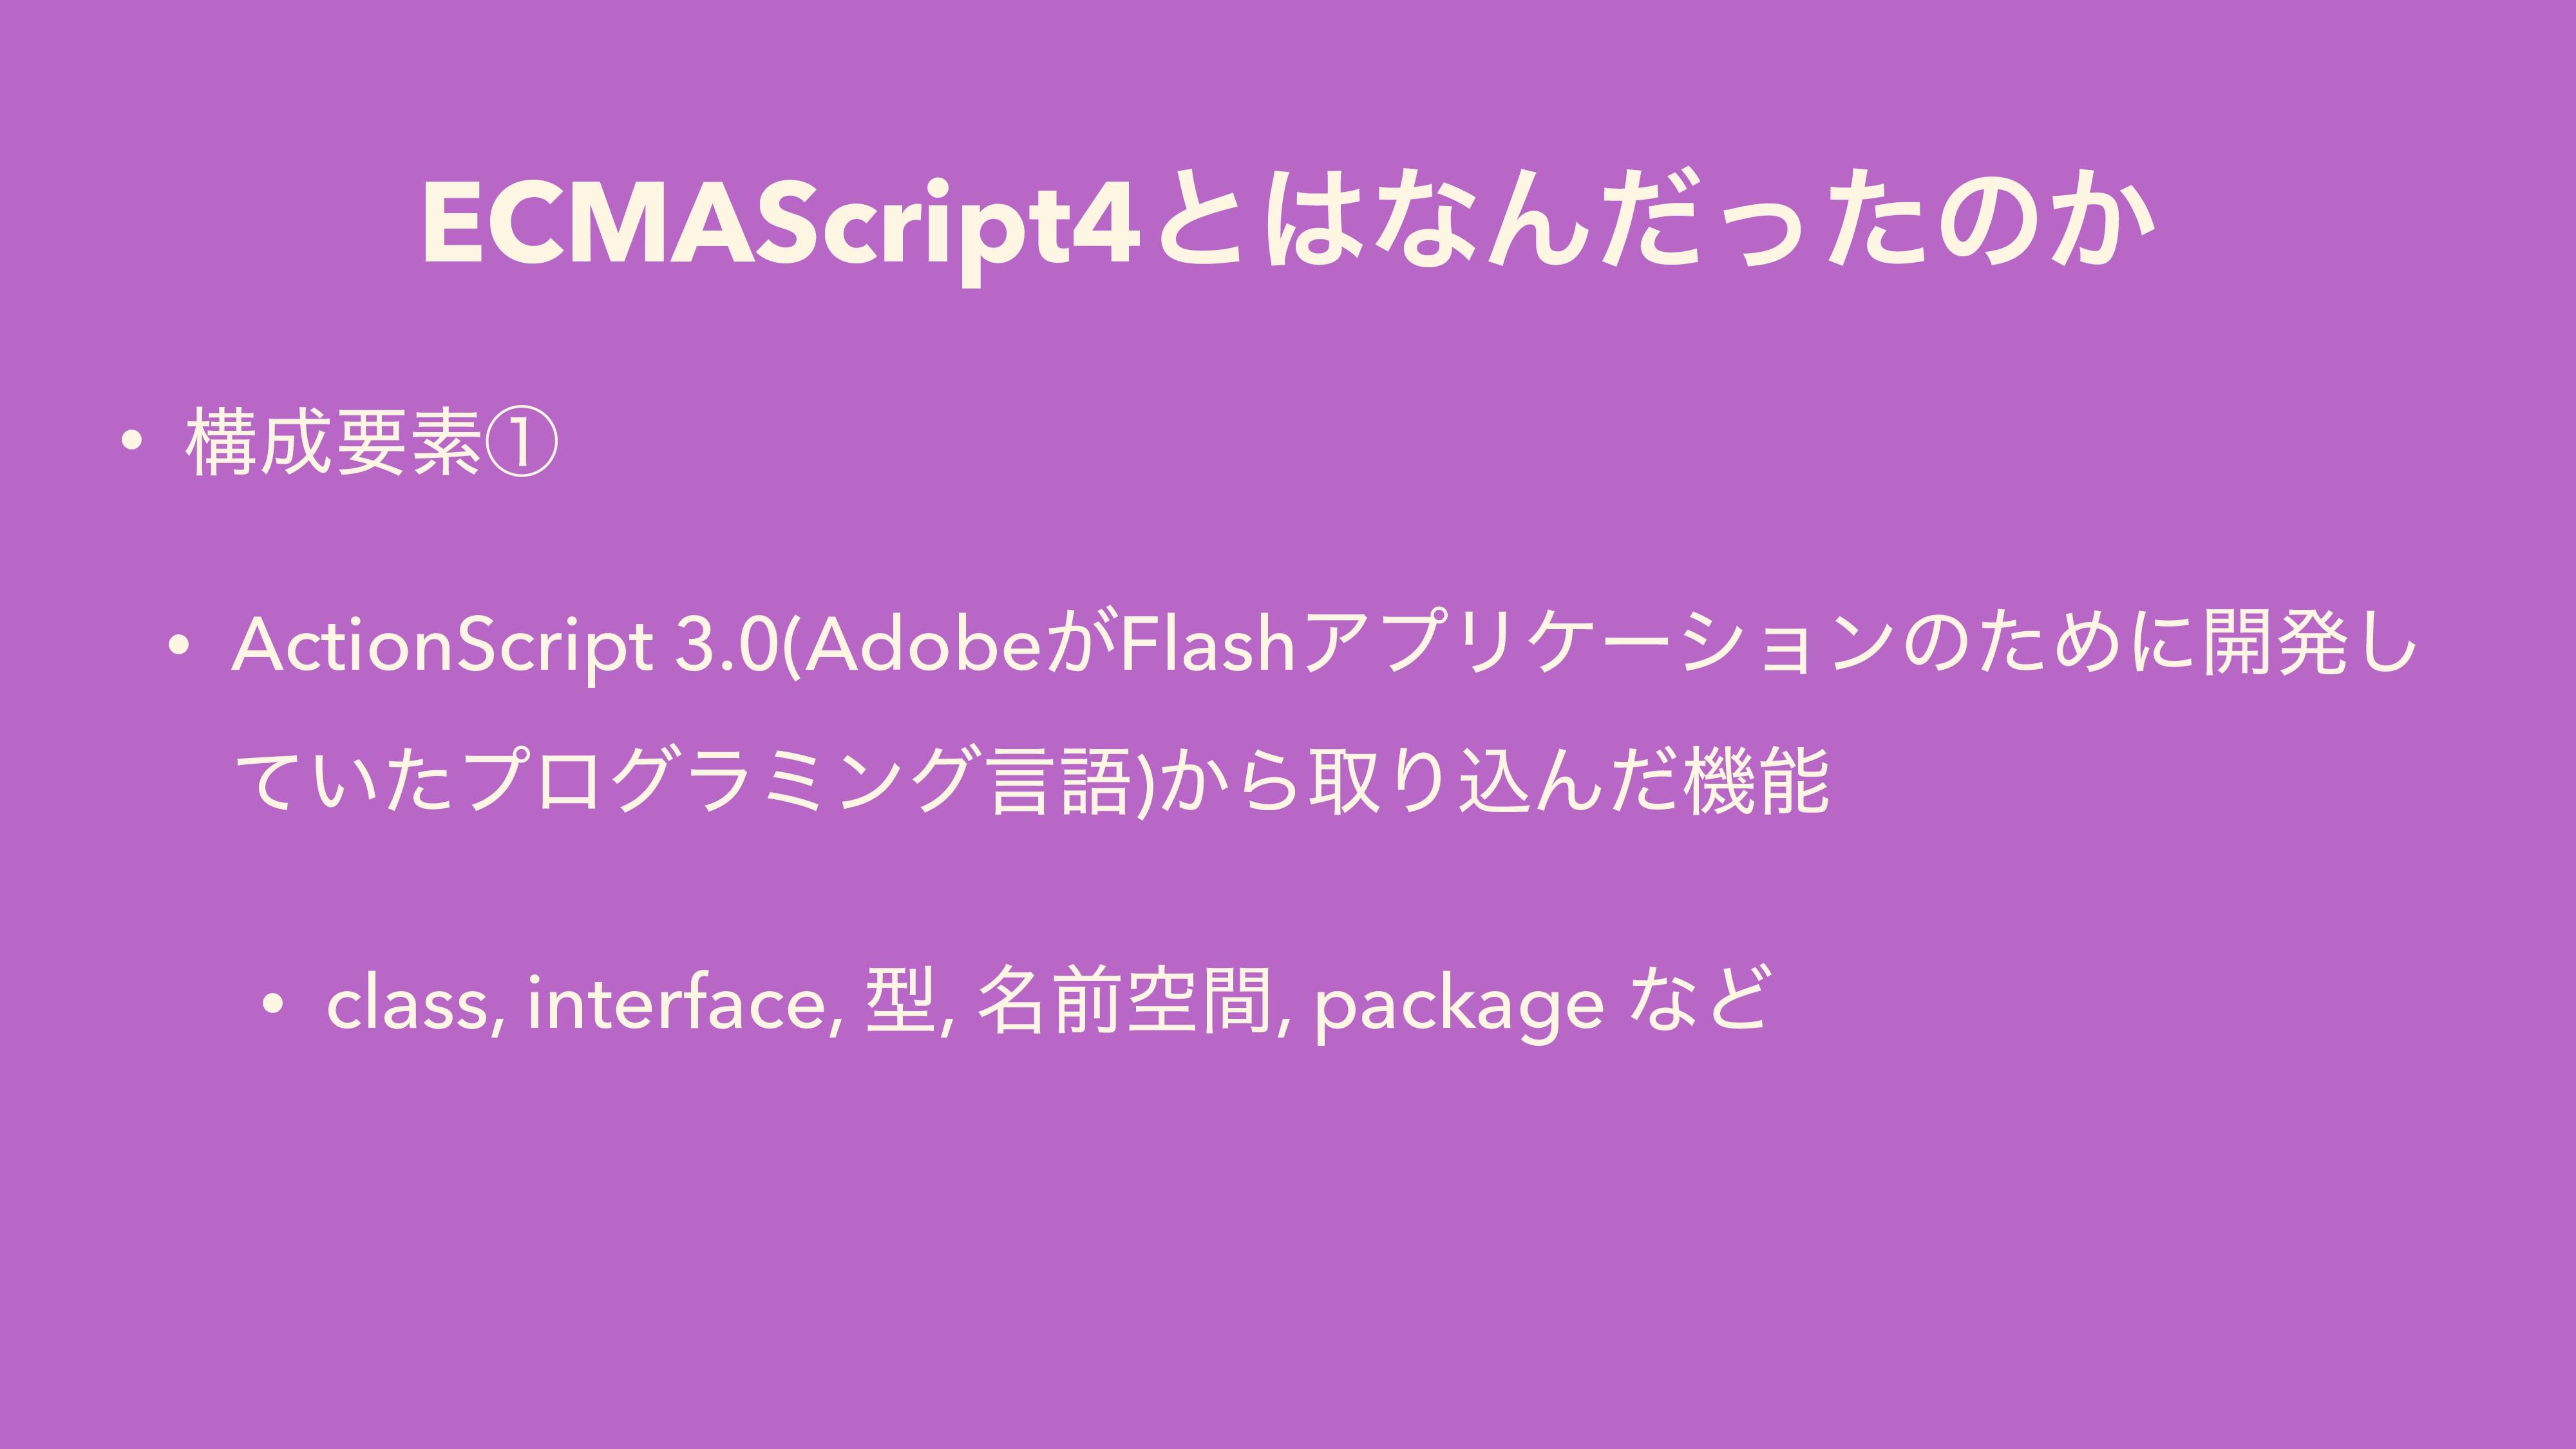 ECMAScript4ͱͳΜͩͬͨͷ͔ • ߏཁૉᶃ • ActionScript 3.0...